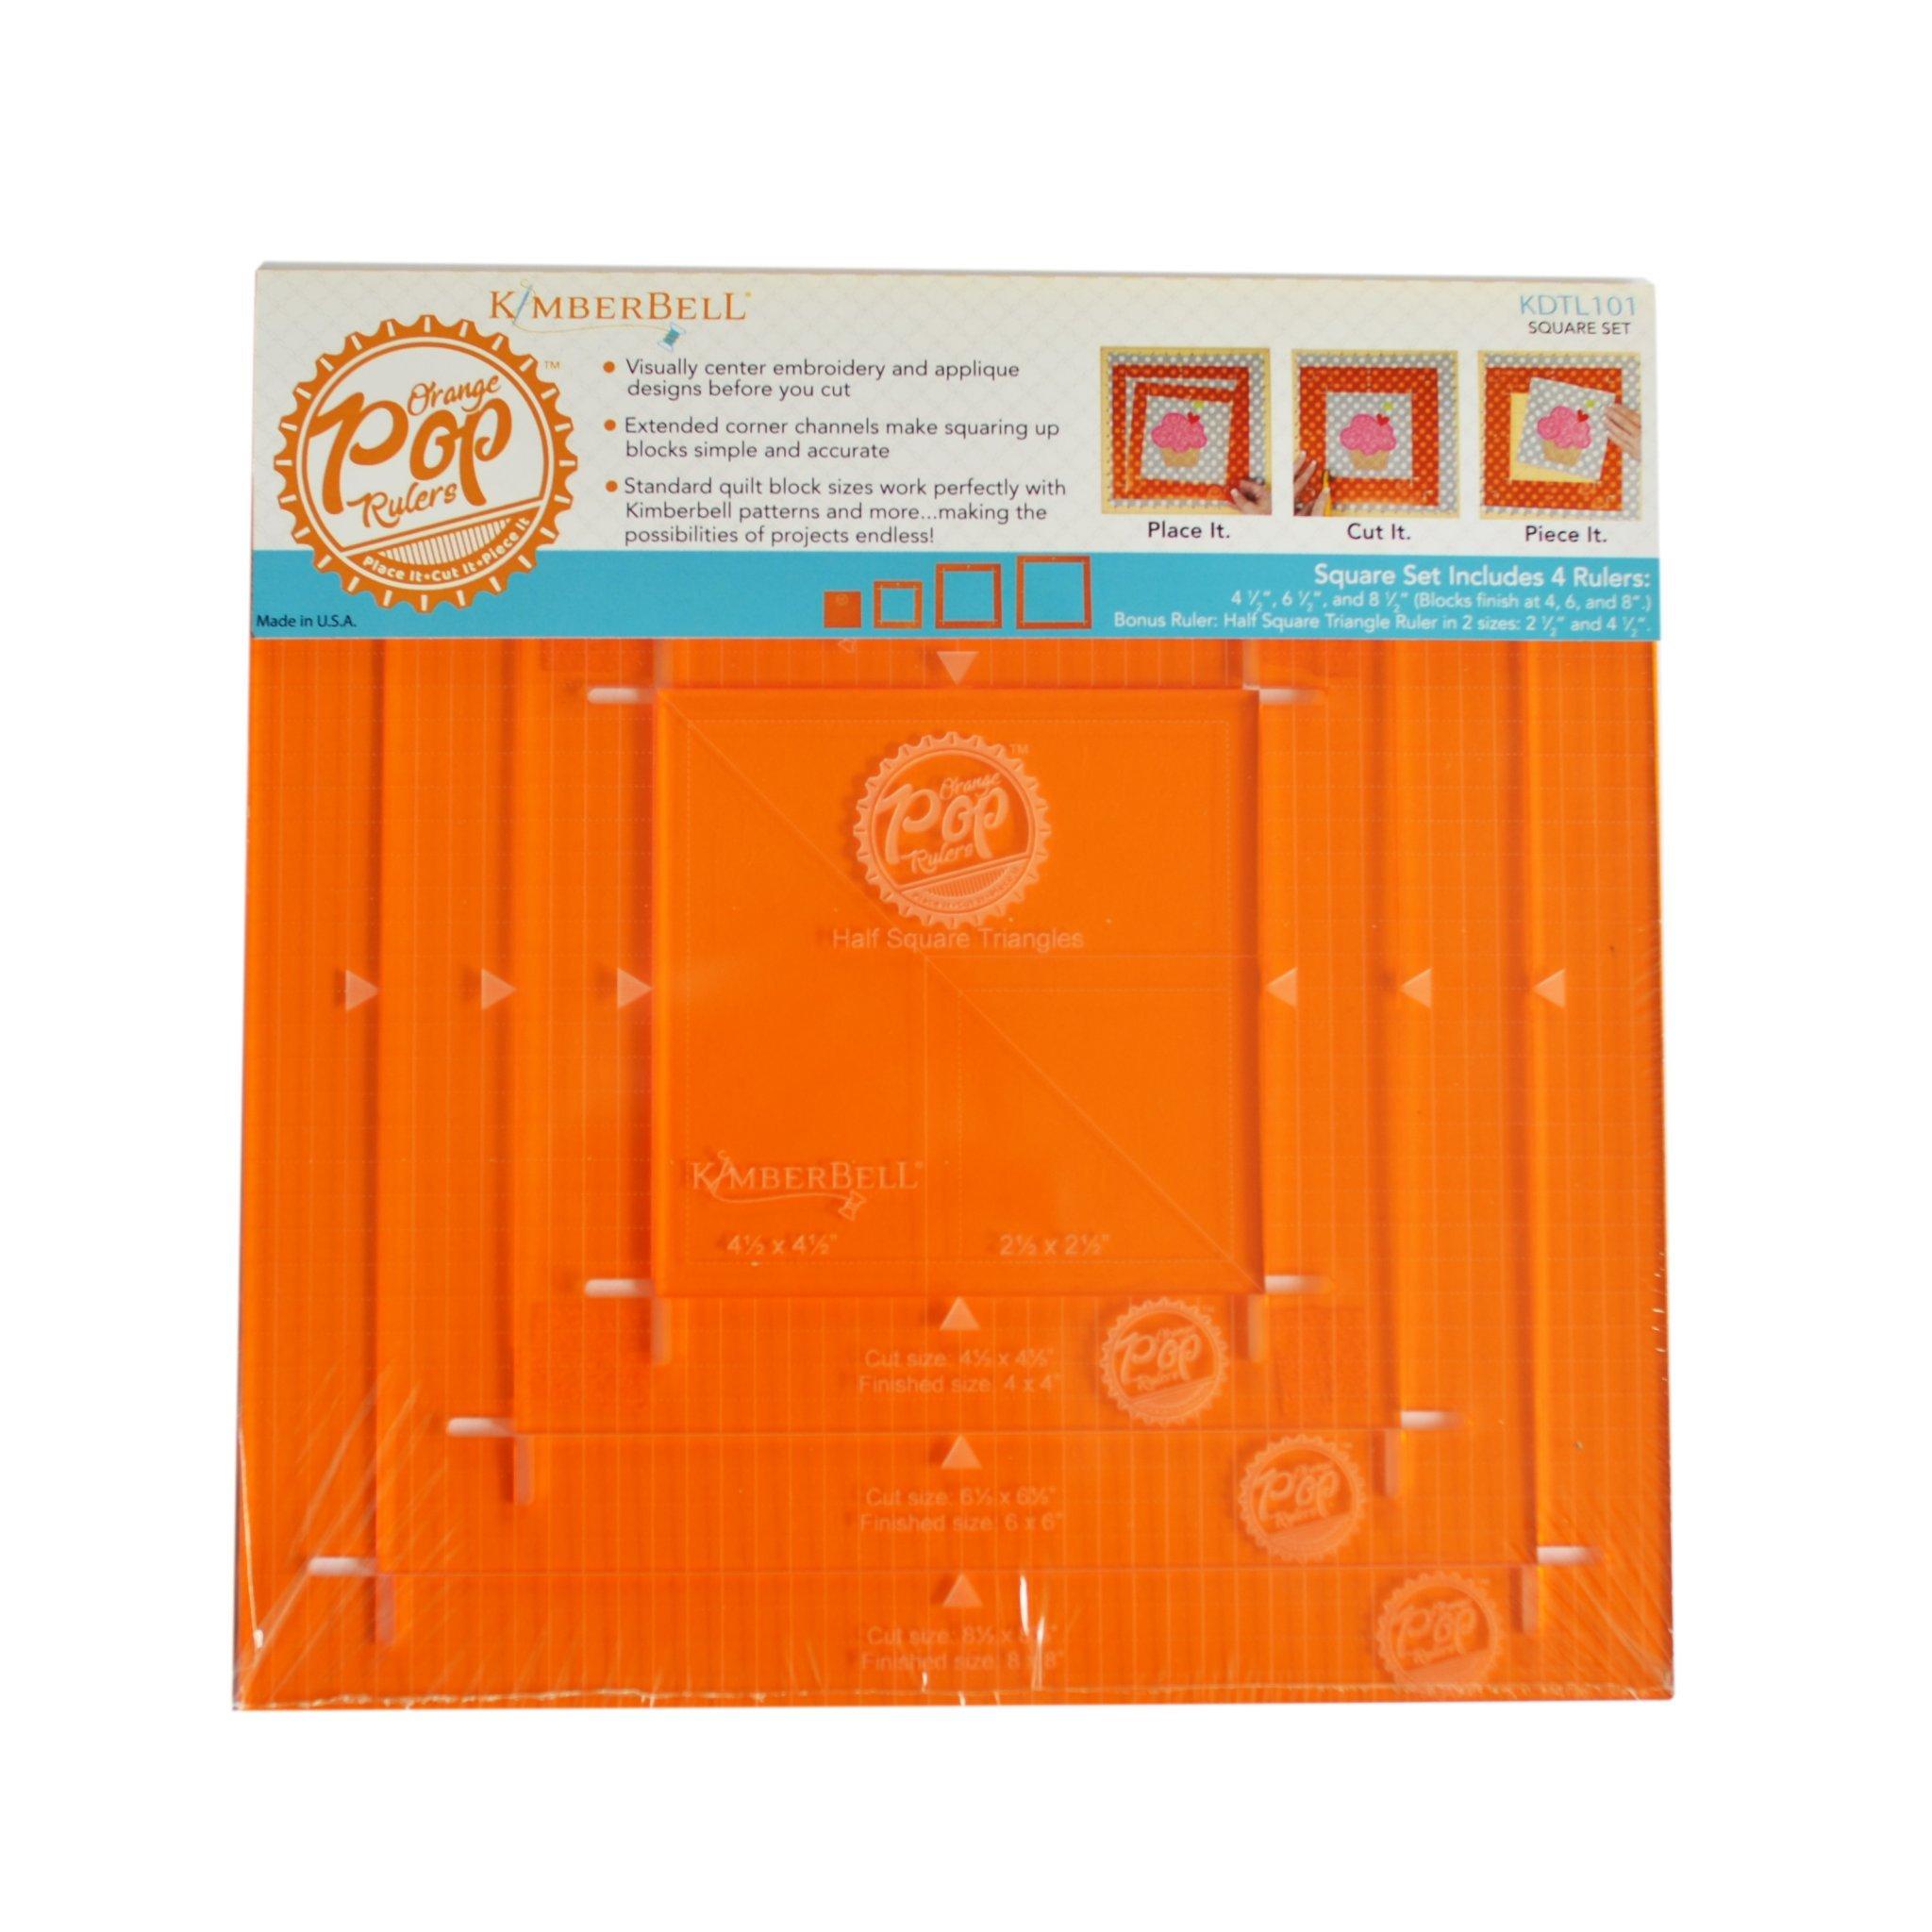 Kimberbell KimberBell Orange Pop Ruler Set - Square, Multi by Kimberbell